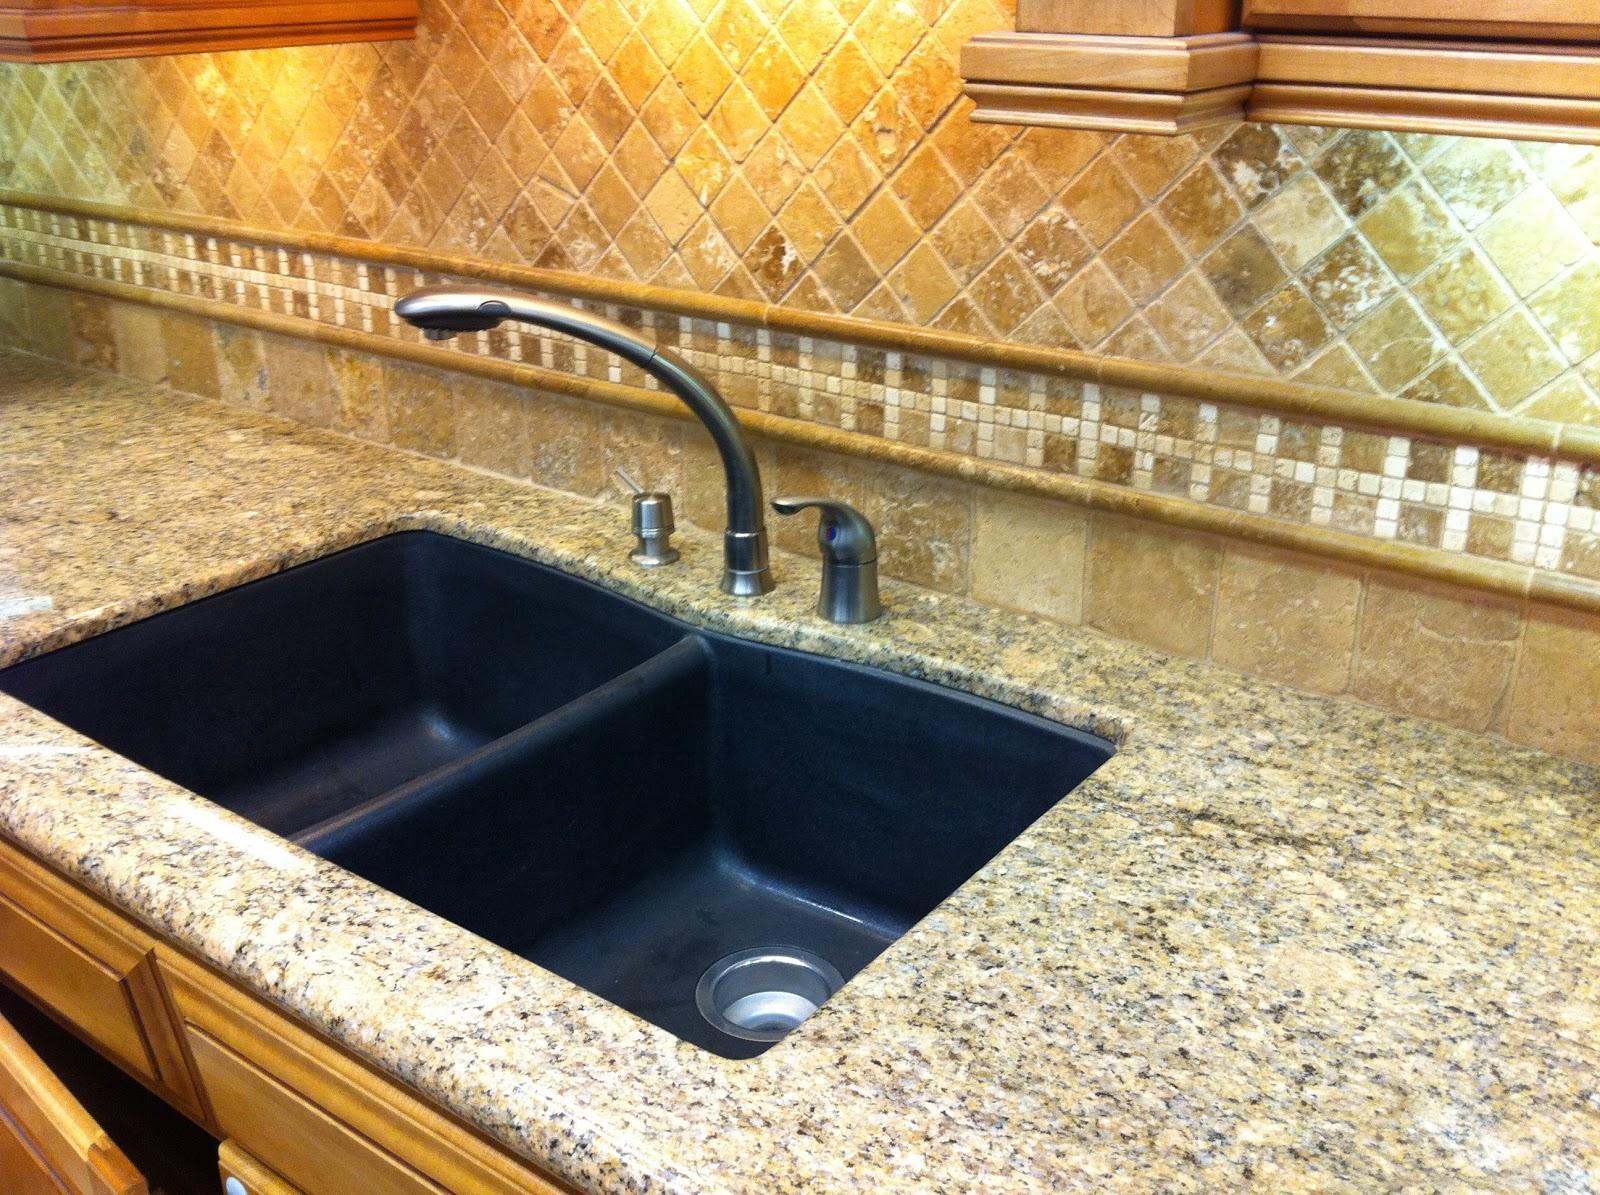 custom granite countertops and tile kitchen counters and backsplash Granite Kitchen Countertop and Tile Backsplash in Pismo Beach California